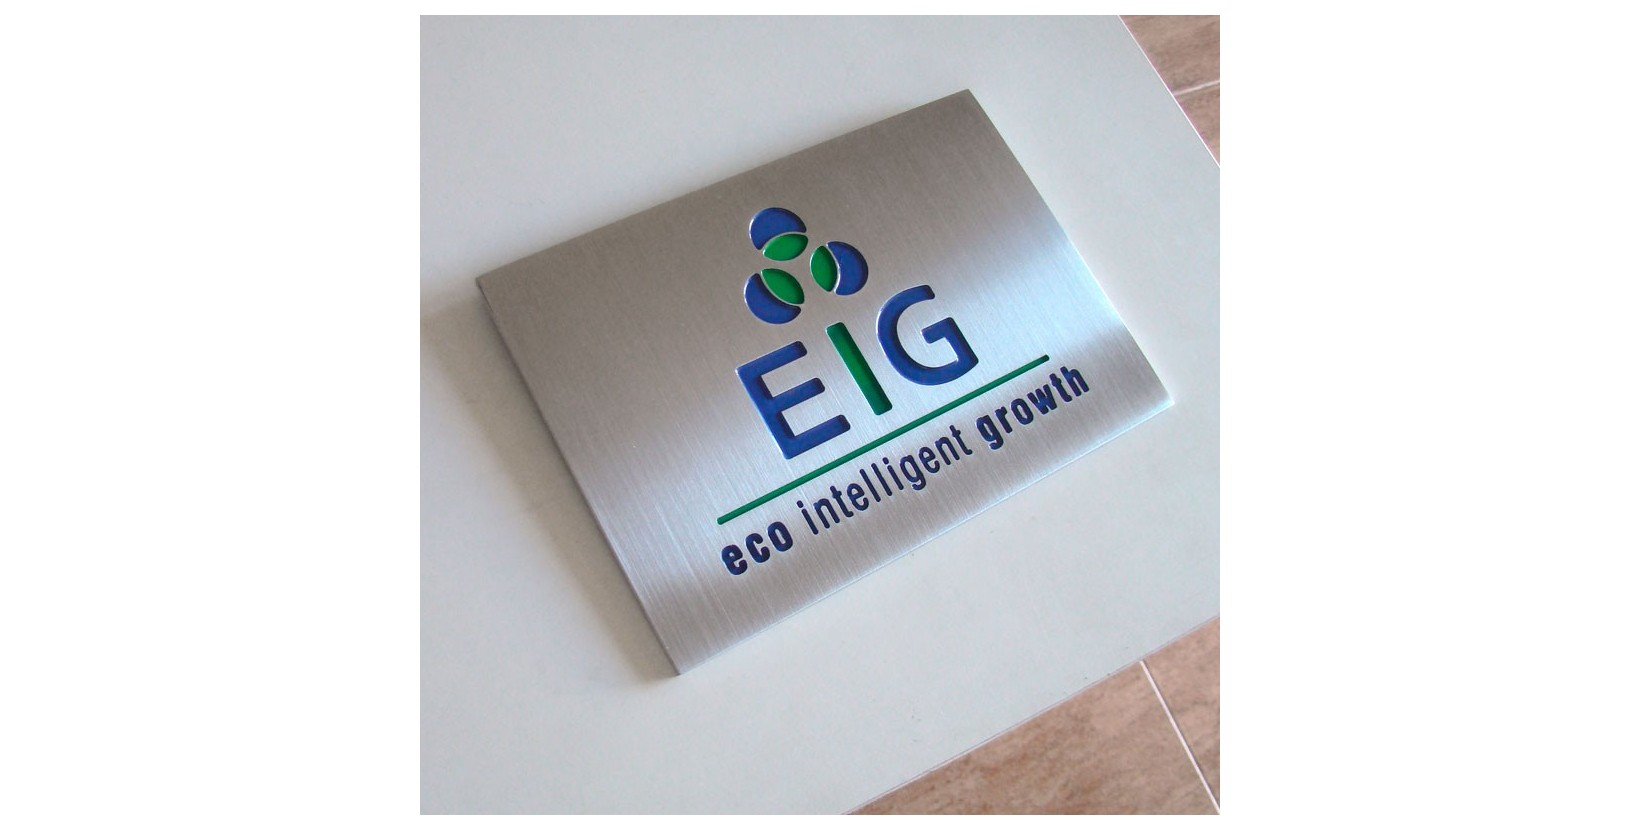 Placa aluminio grabado placas grabadas placa grabada - Placa de aluminio ...